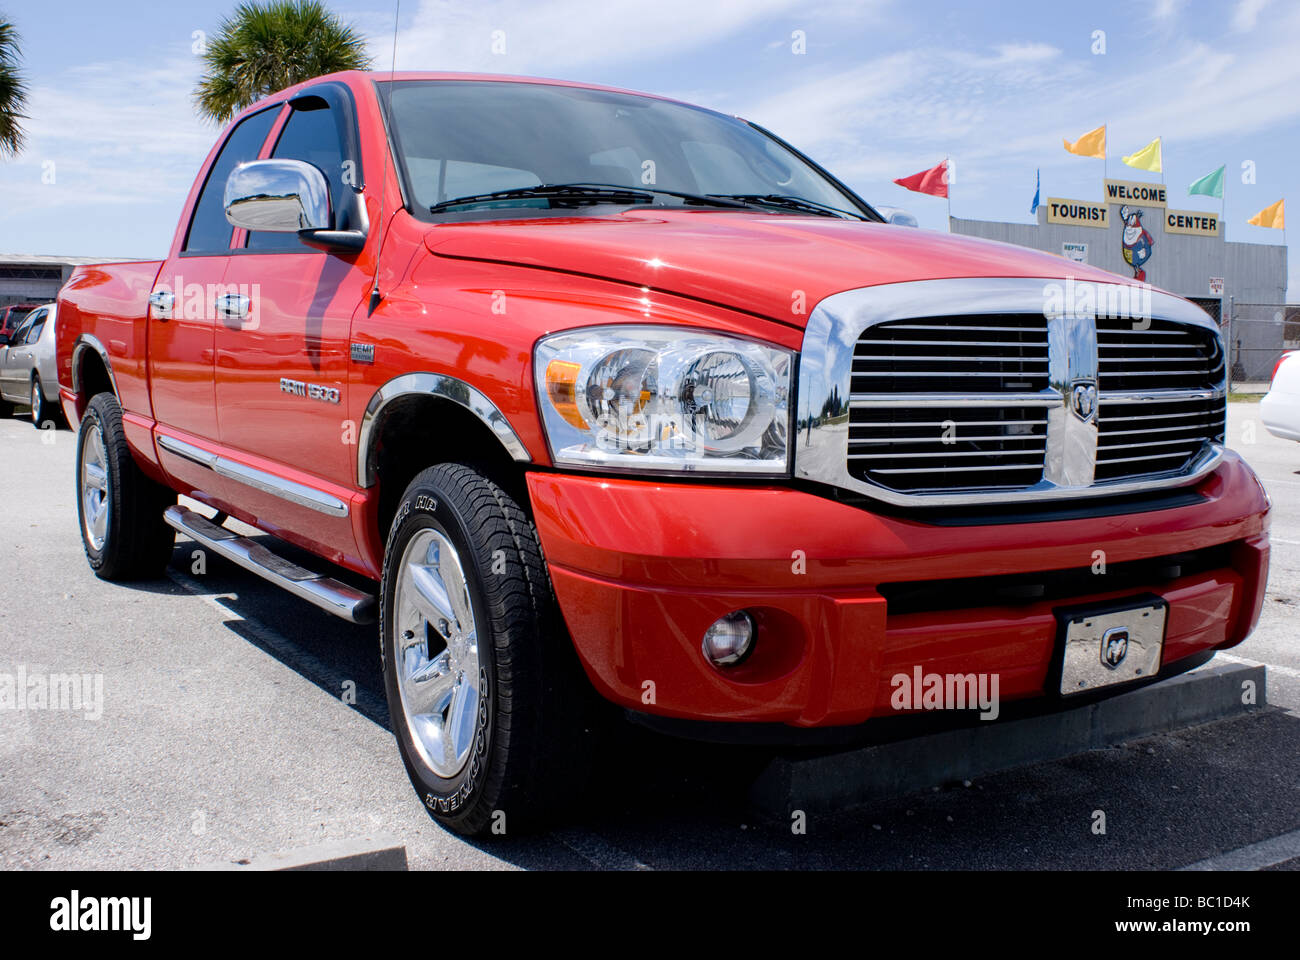 Dodge Ram 1500 in Florida parking lot - Stock Image